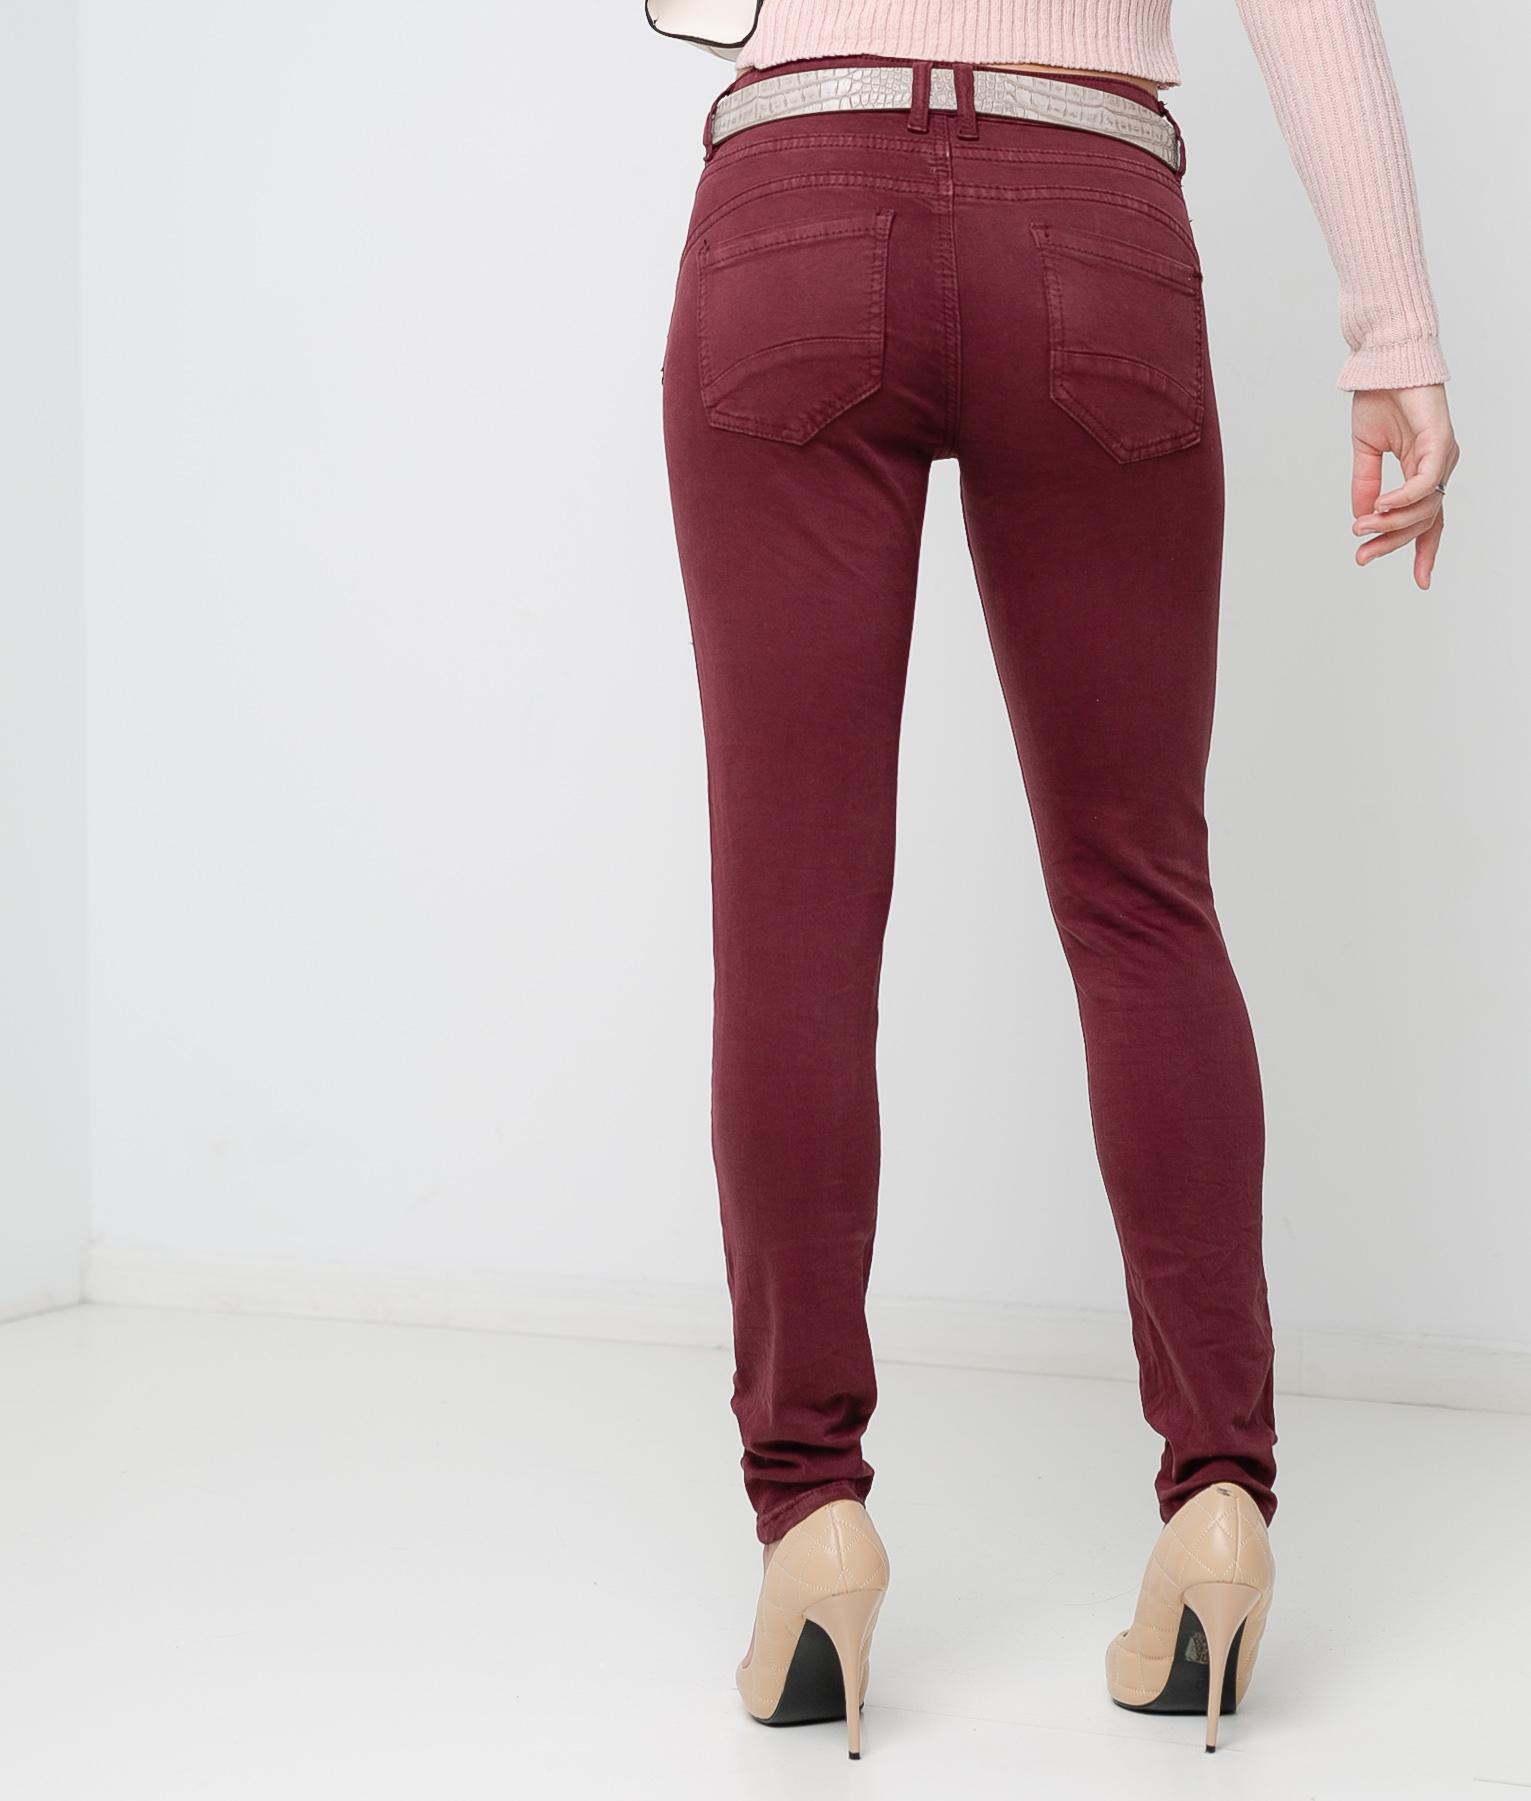 Pantaloni Mainer - Granato